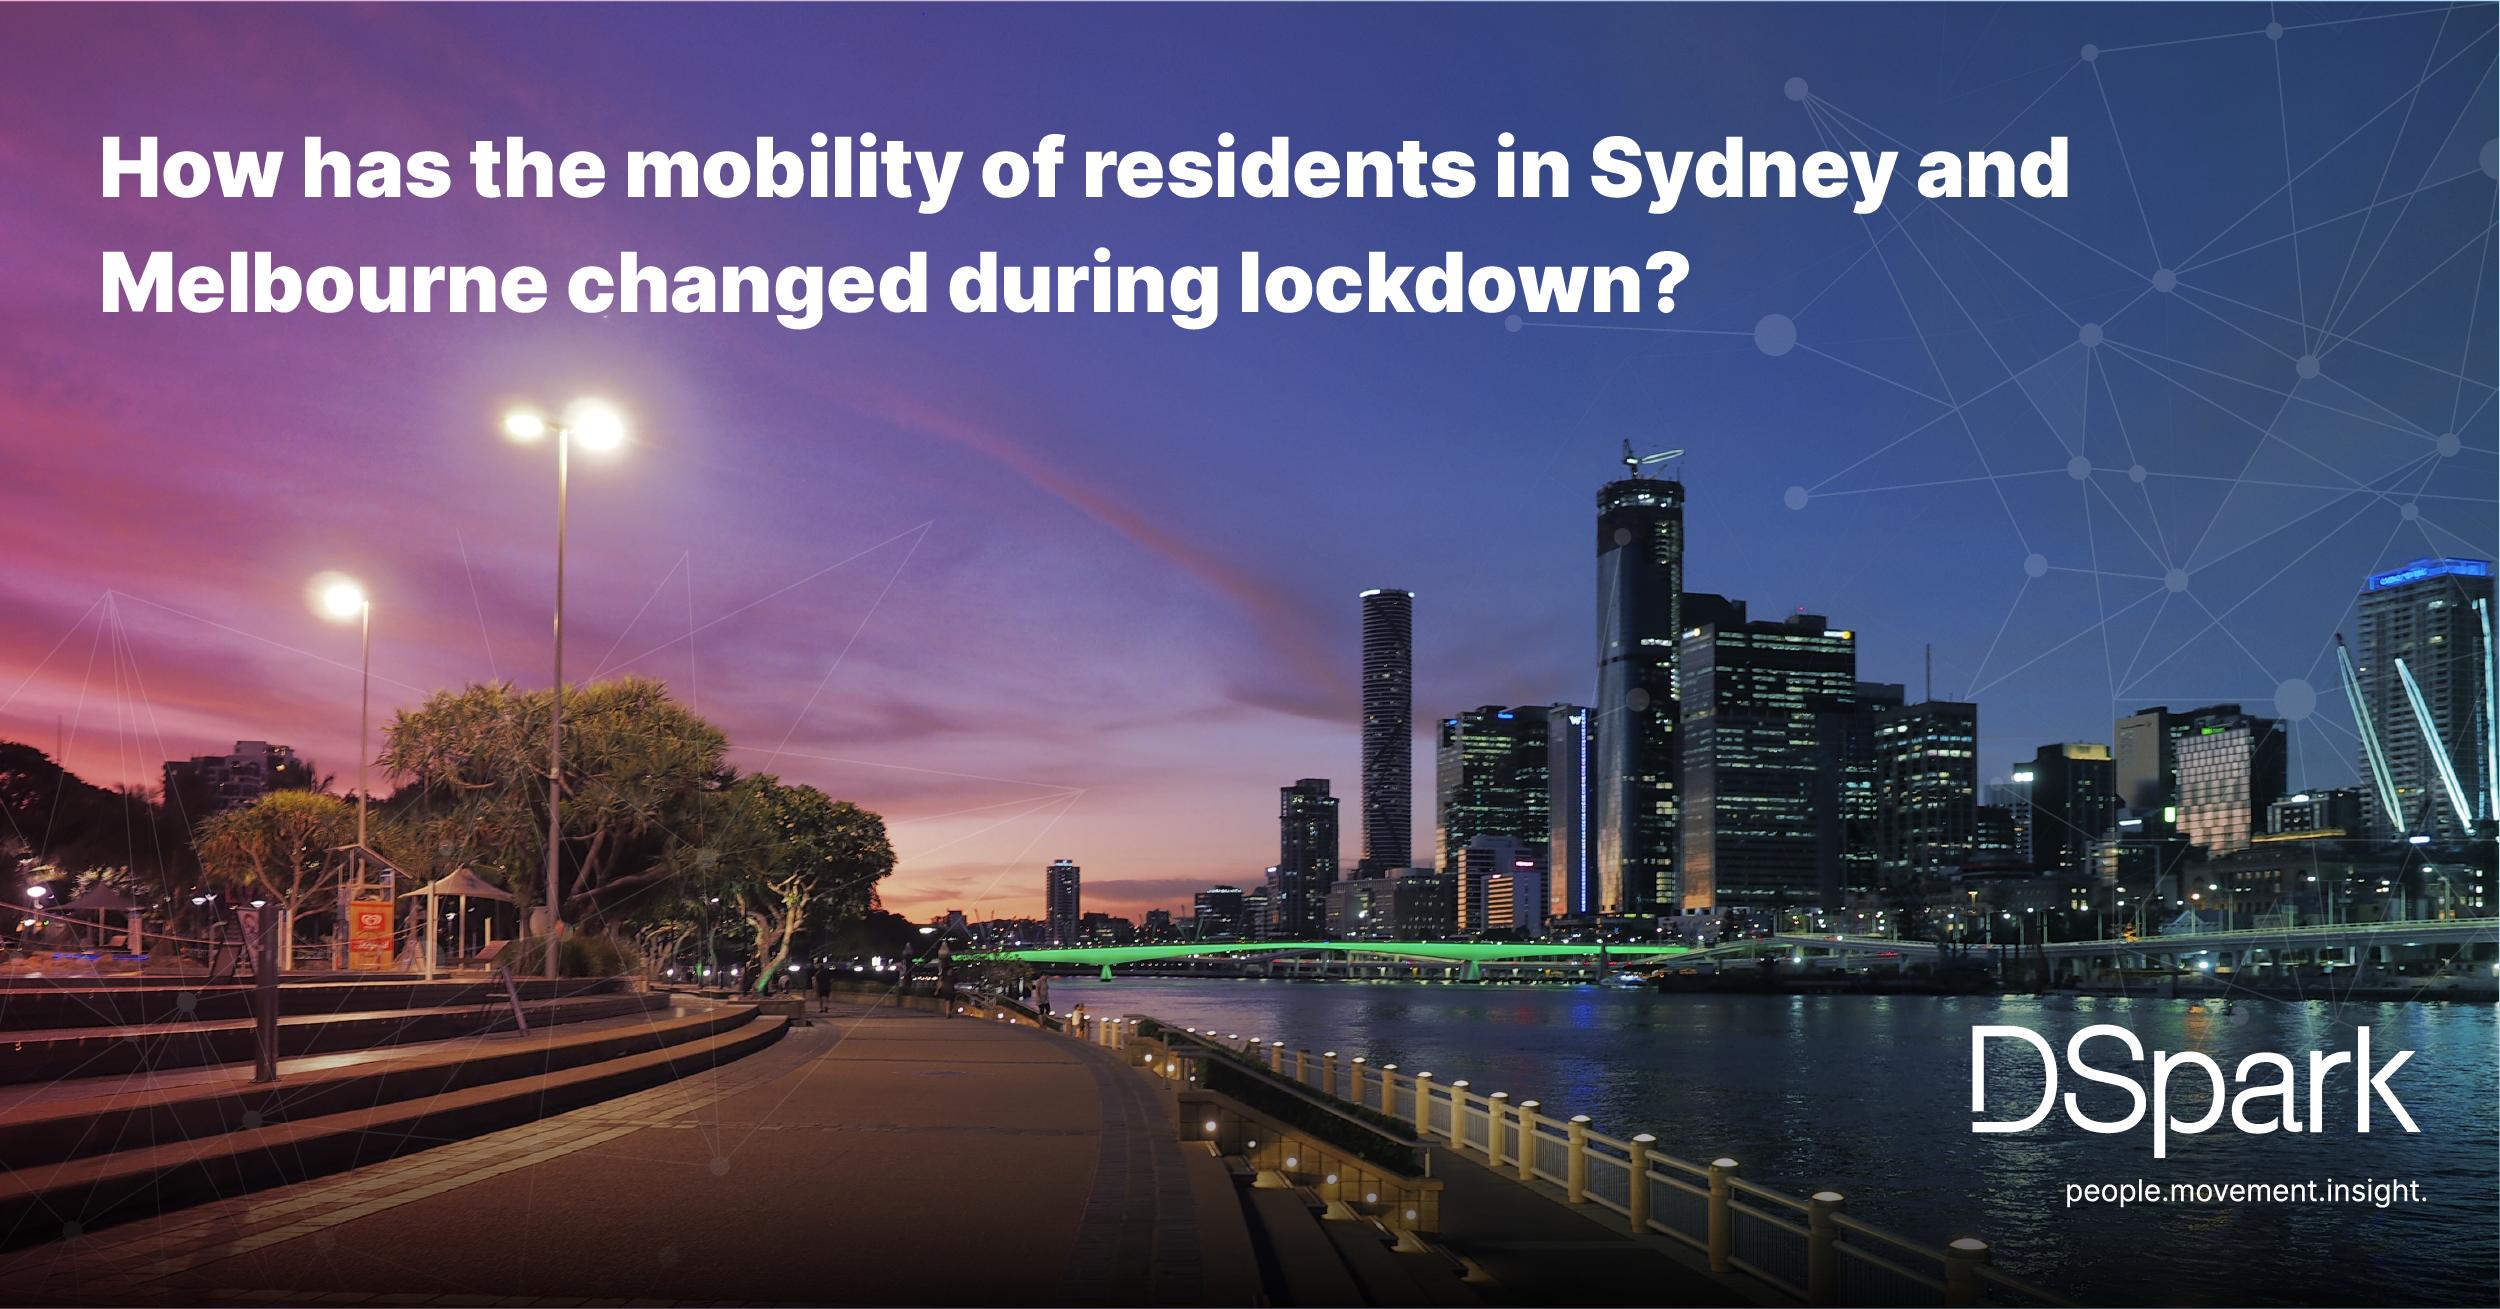 Mobility change in lockdown